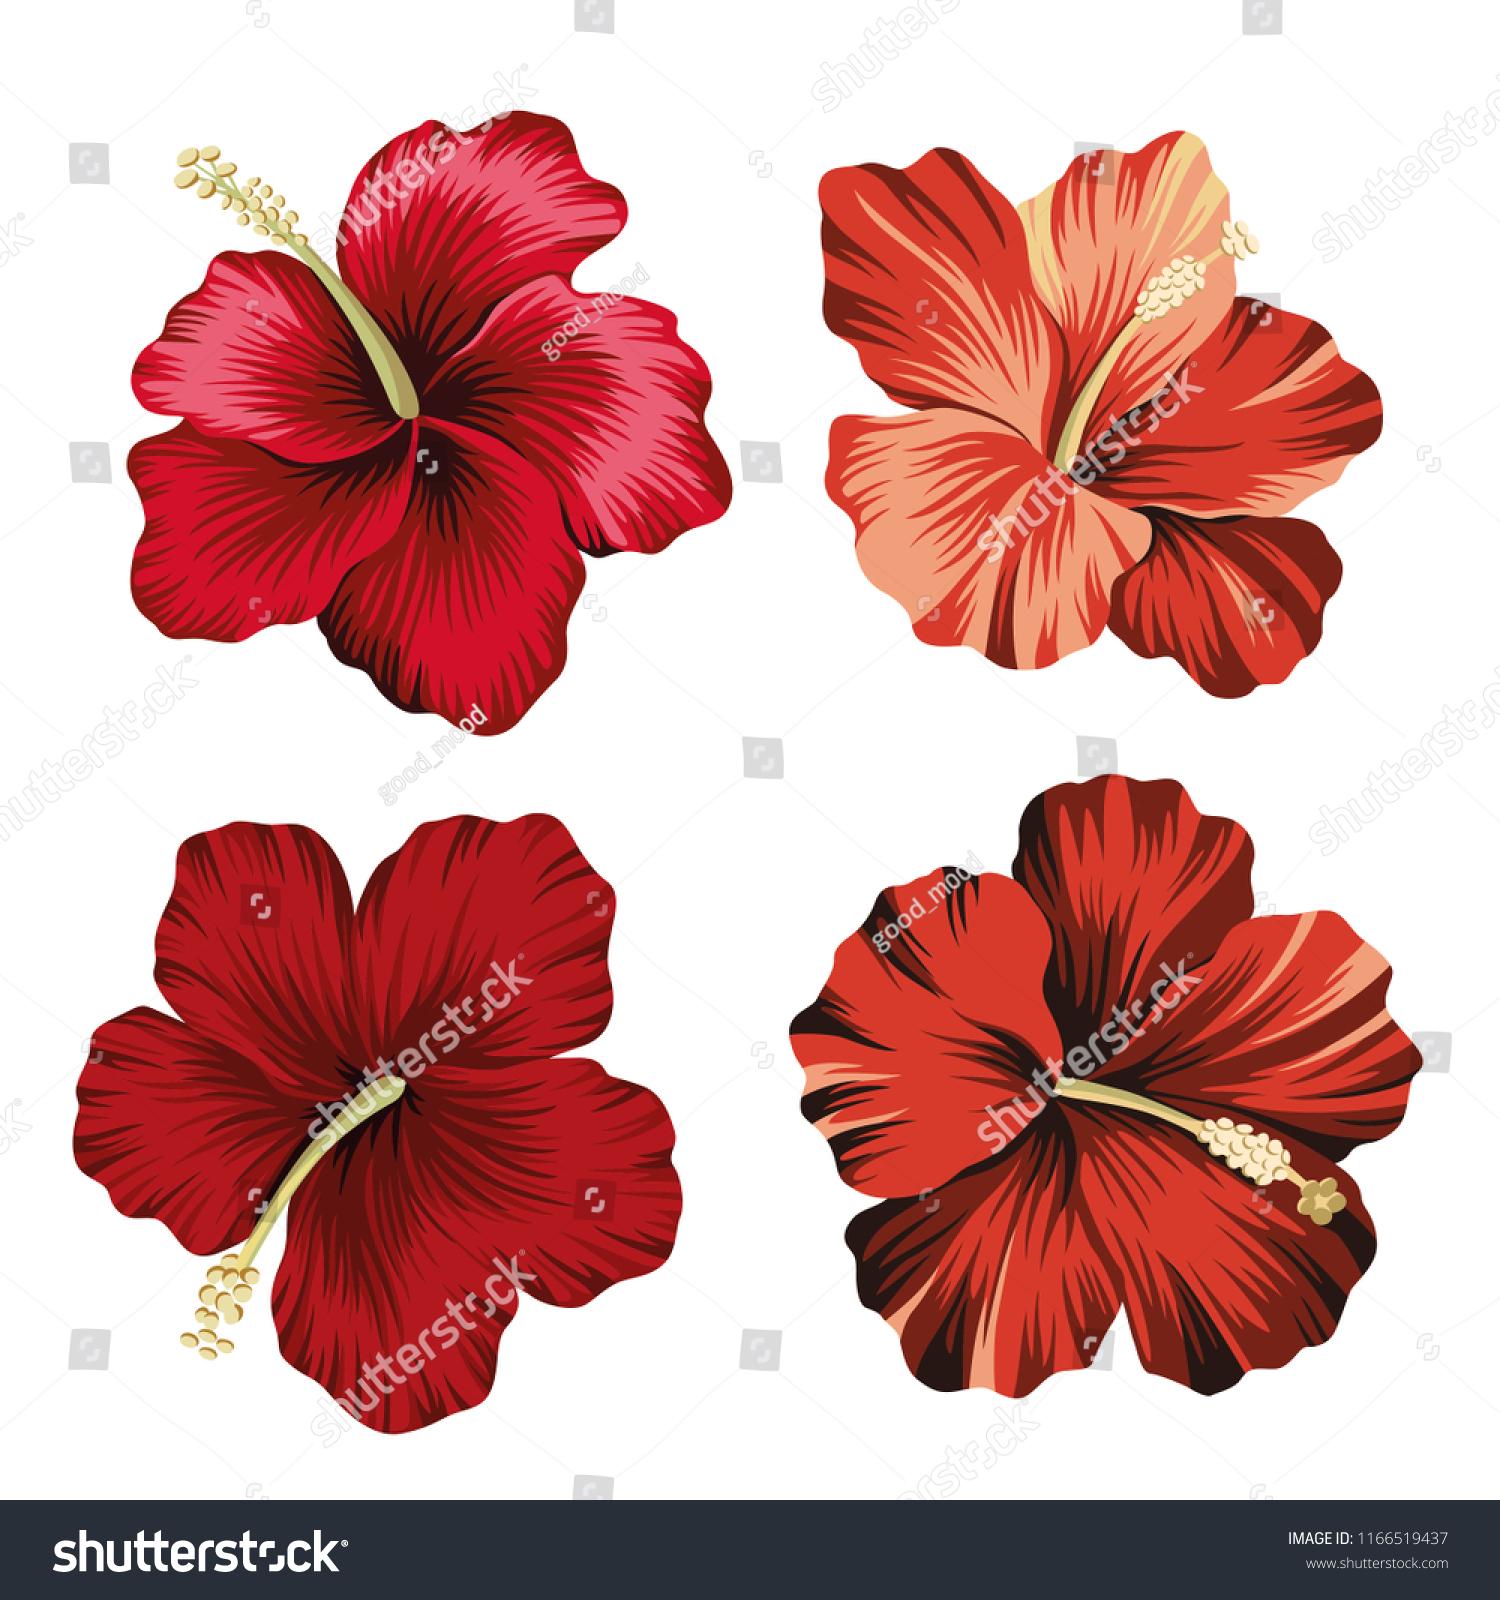 Vintage hawaiian flower clipart topsimages stock vector tropical vintage hibiscus flower clip art exotic floral botanical print jpg 1500x1600 vintage hawaiian izmirmasajfo